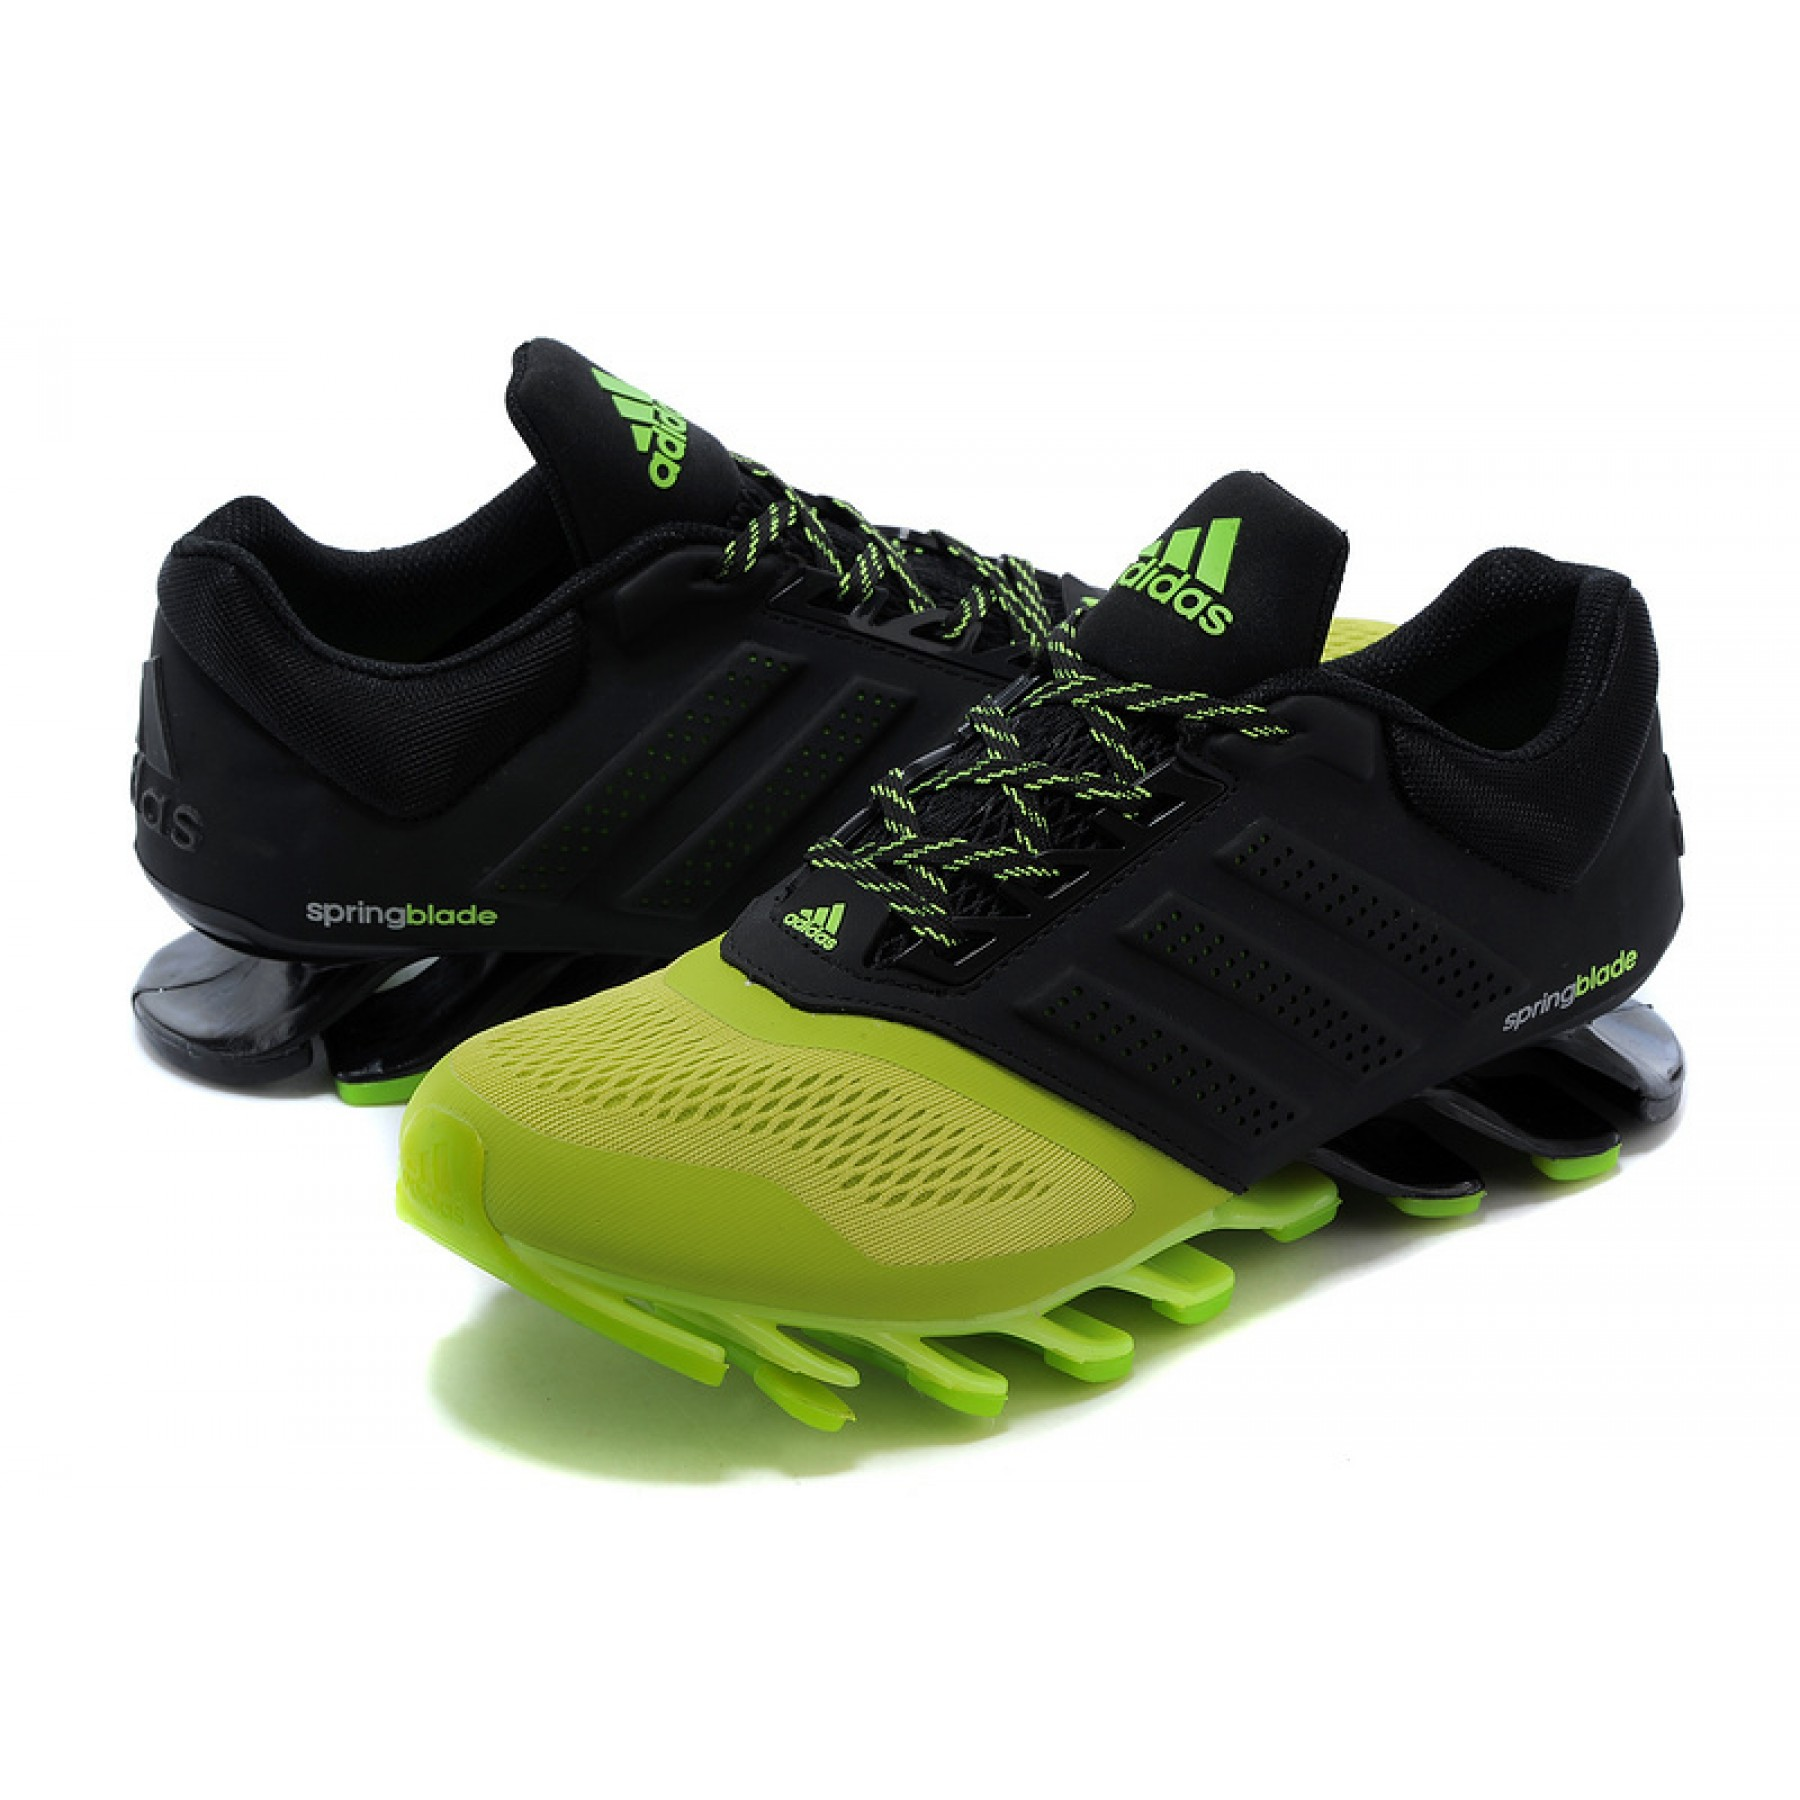 reputable site 114d3 5a83b ... low price tênis adidas springblade drive 2.0 masculino cor preto e  verde oliva cod 0568 8036b ...